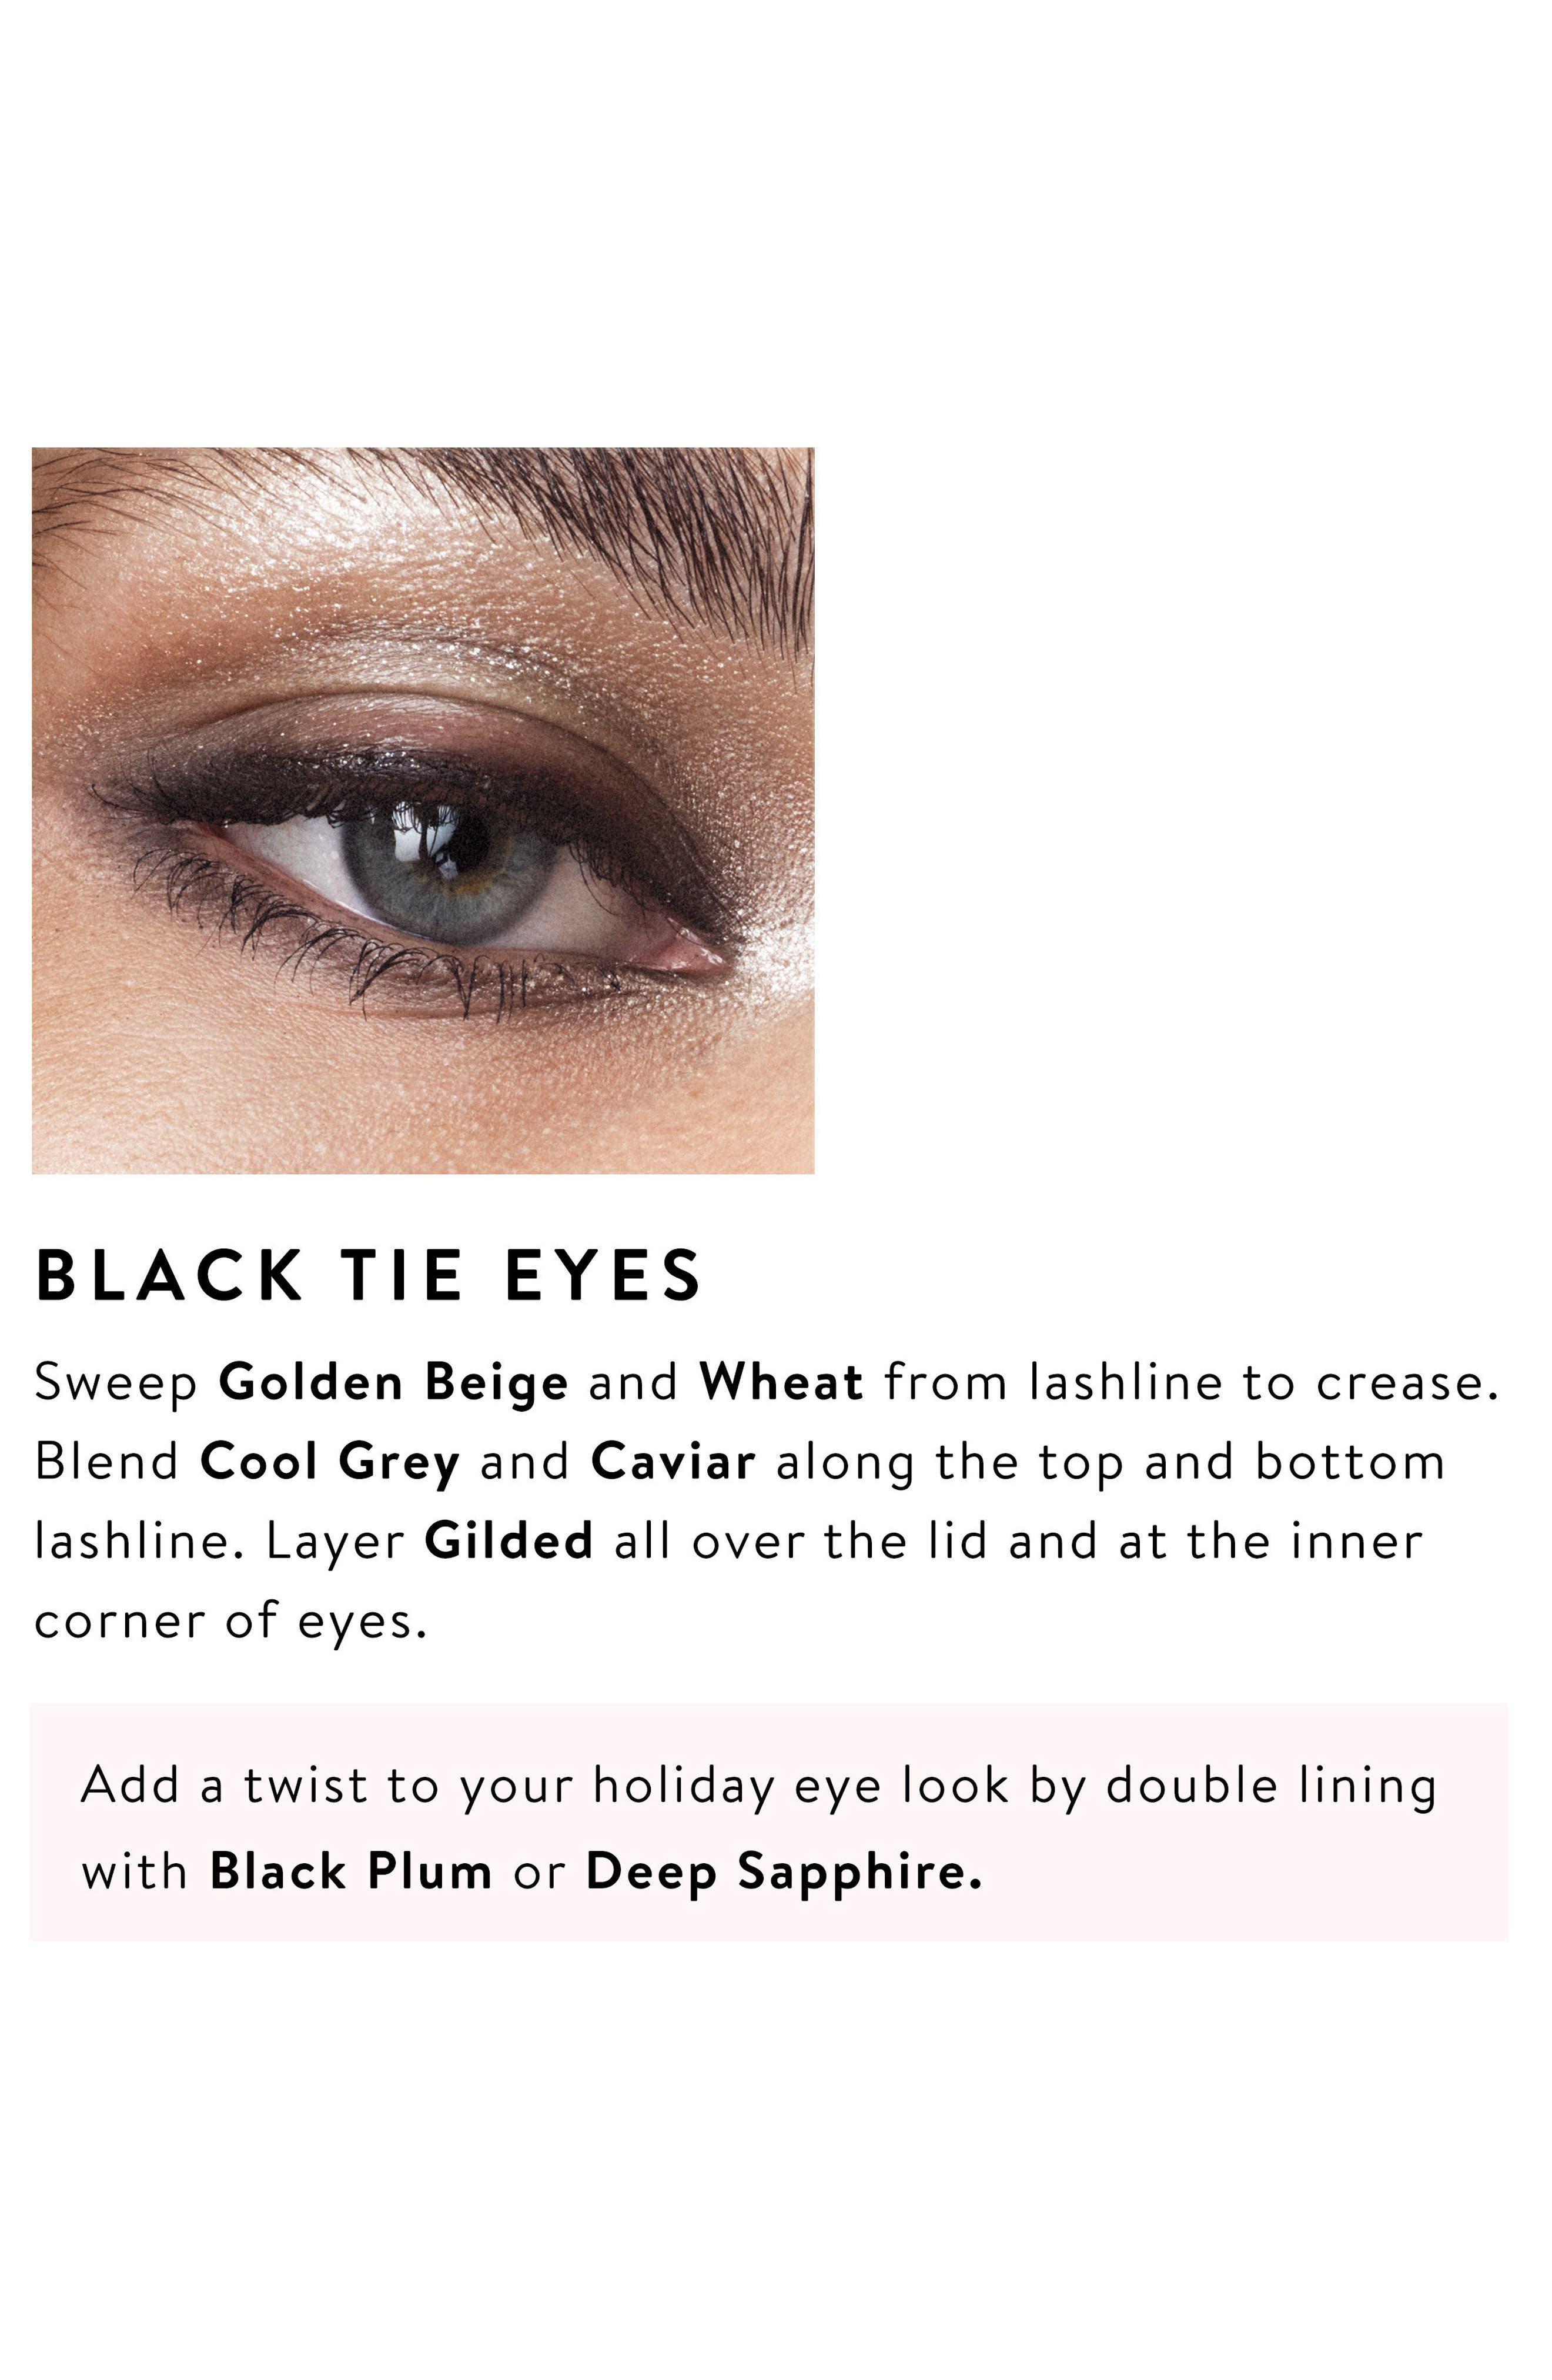 Caviar & Rubies Eyeshadow Palette,                             Alternate thumbnail 4, color,                             000